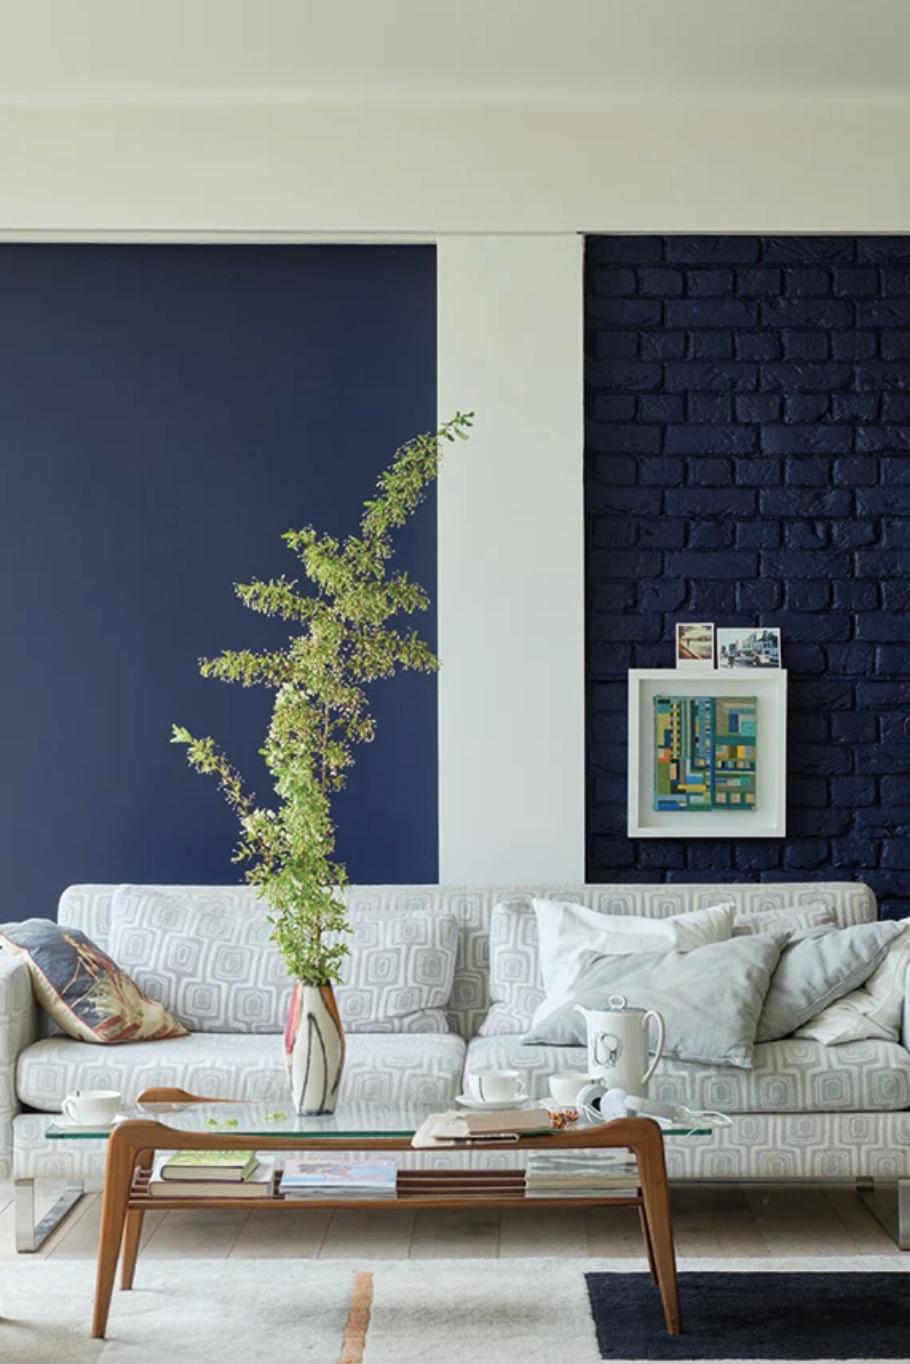 Scotch Blue - Farrow & Ball Decor Color Palette for 2021, interior decoration website design color mood board hook agency